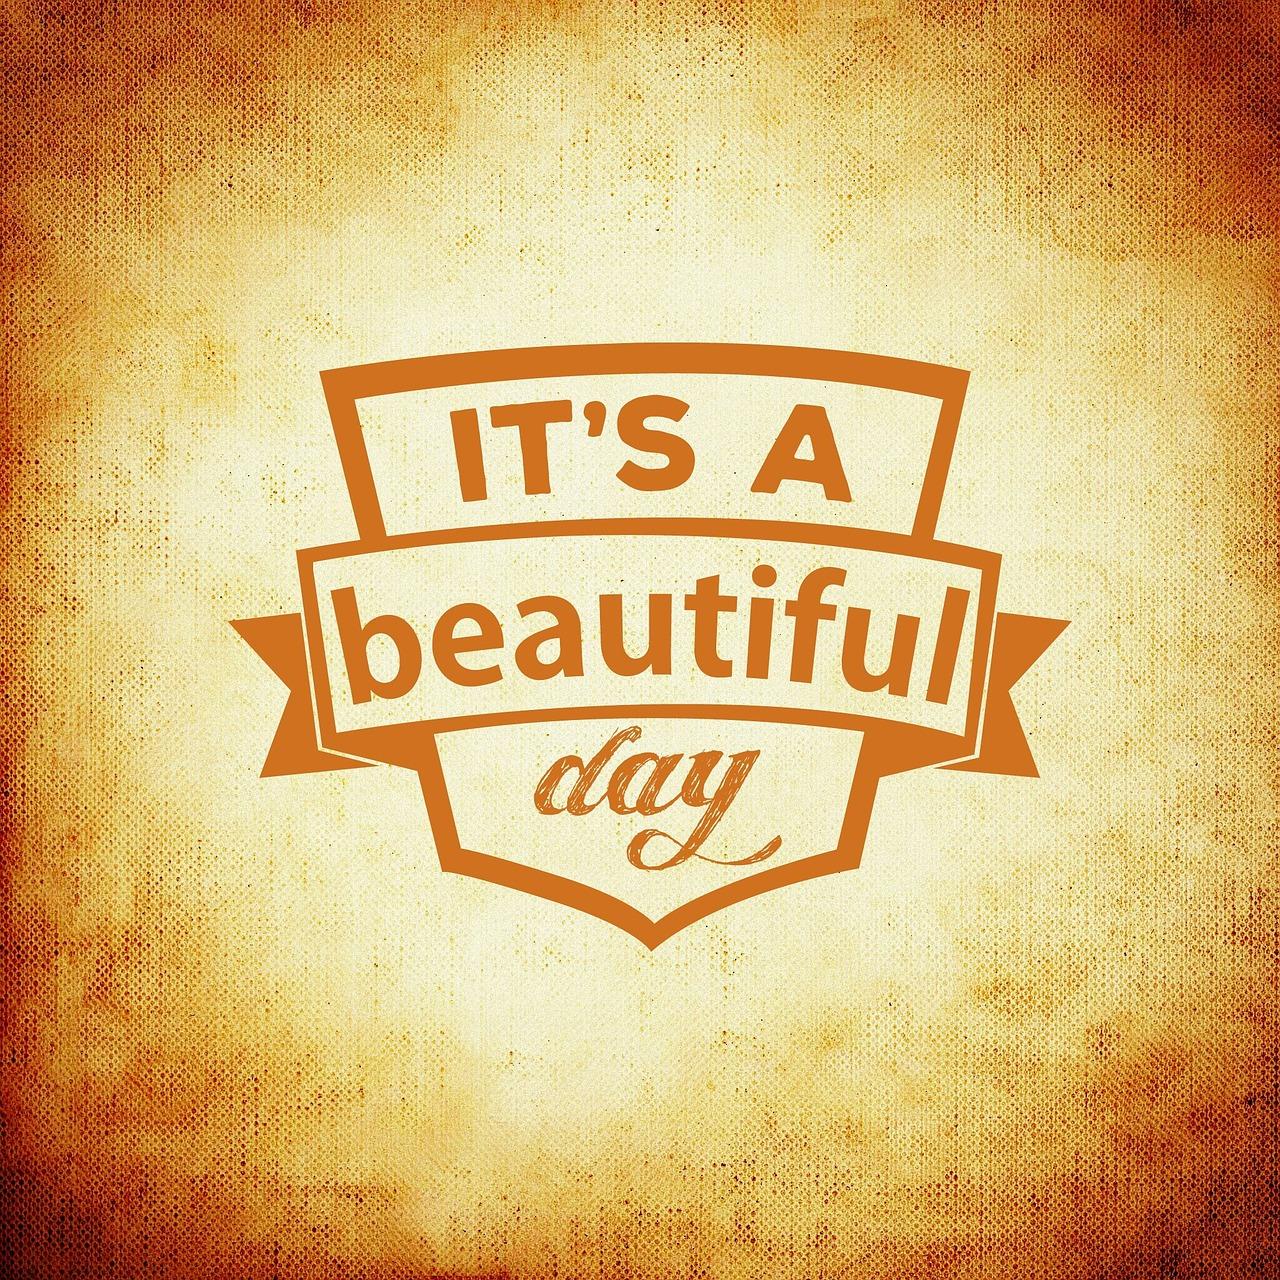 World celebrates the International Beauty Day